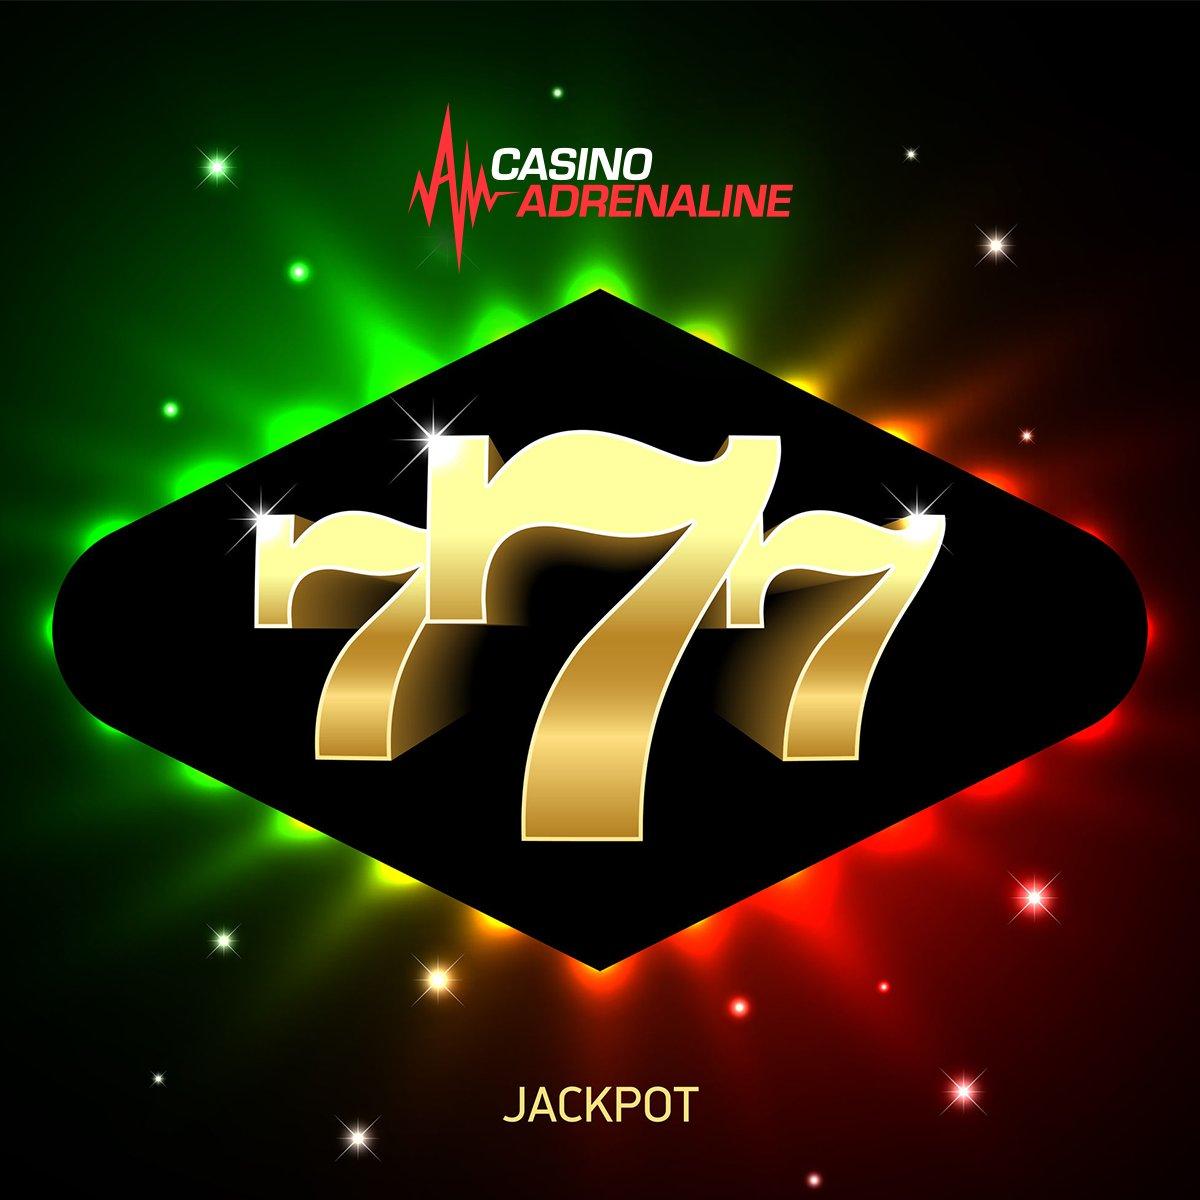 test Twitter Media - Don't forget to check our total #Jackpot today!  #CasinoAdrenaline #enjoythegame Visit:  https://t.co/oSXfIB6U5E https://t.co/czDArUHzn4